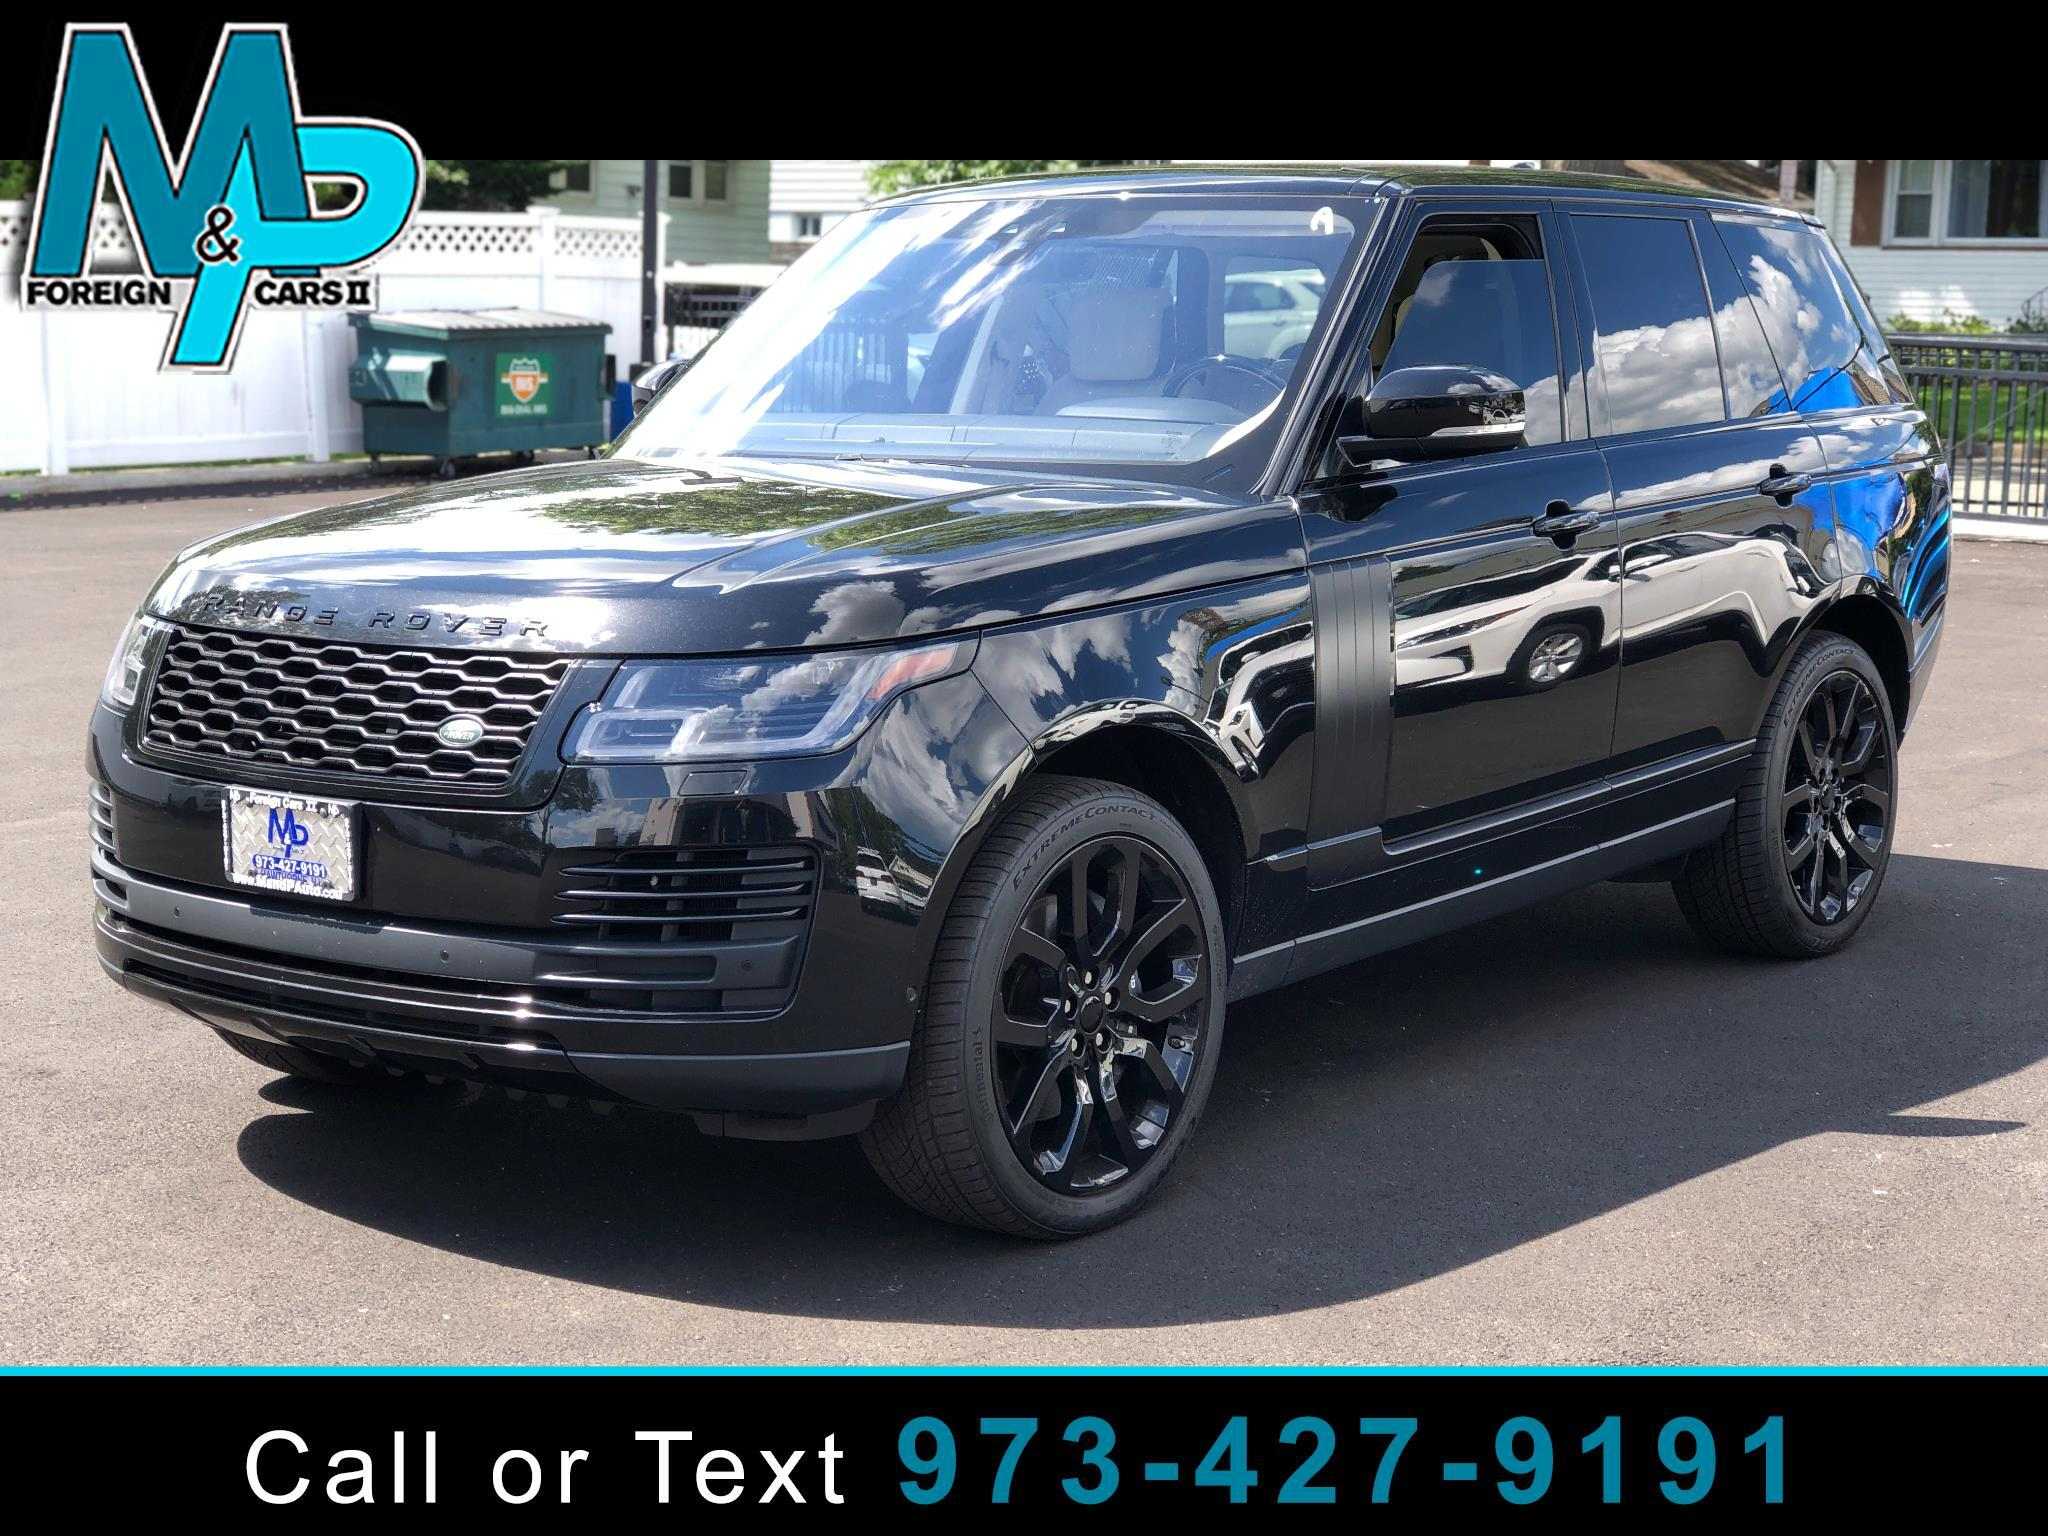 Land Rover Range Rover V8 Supercharged SWB 2018